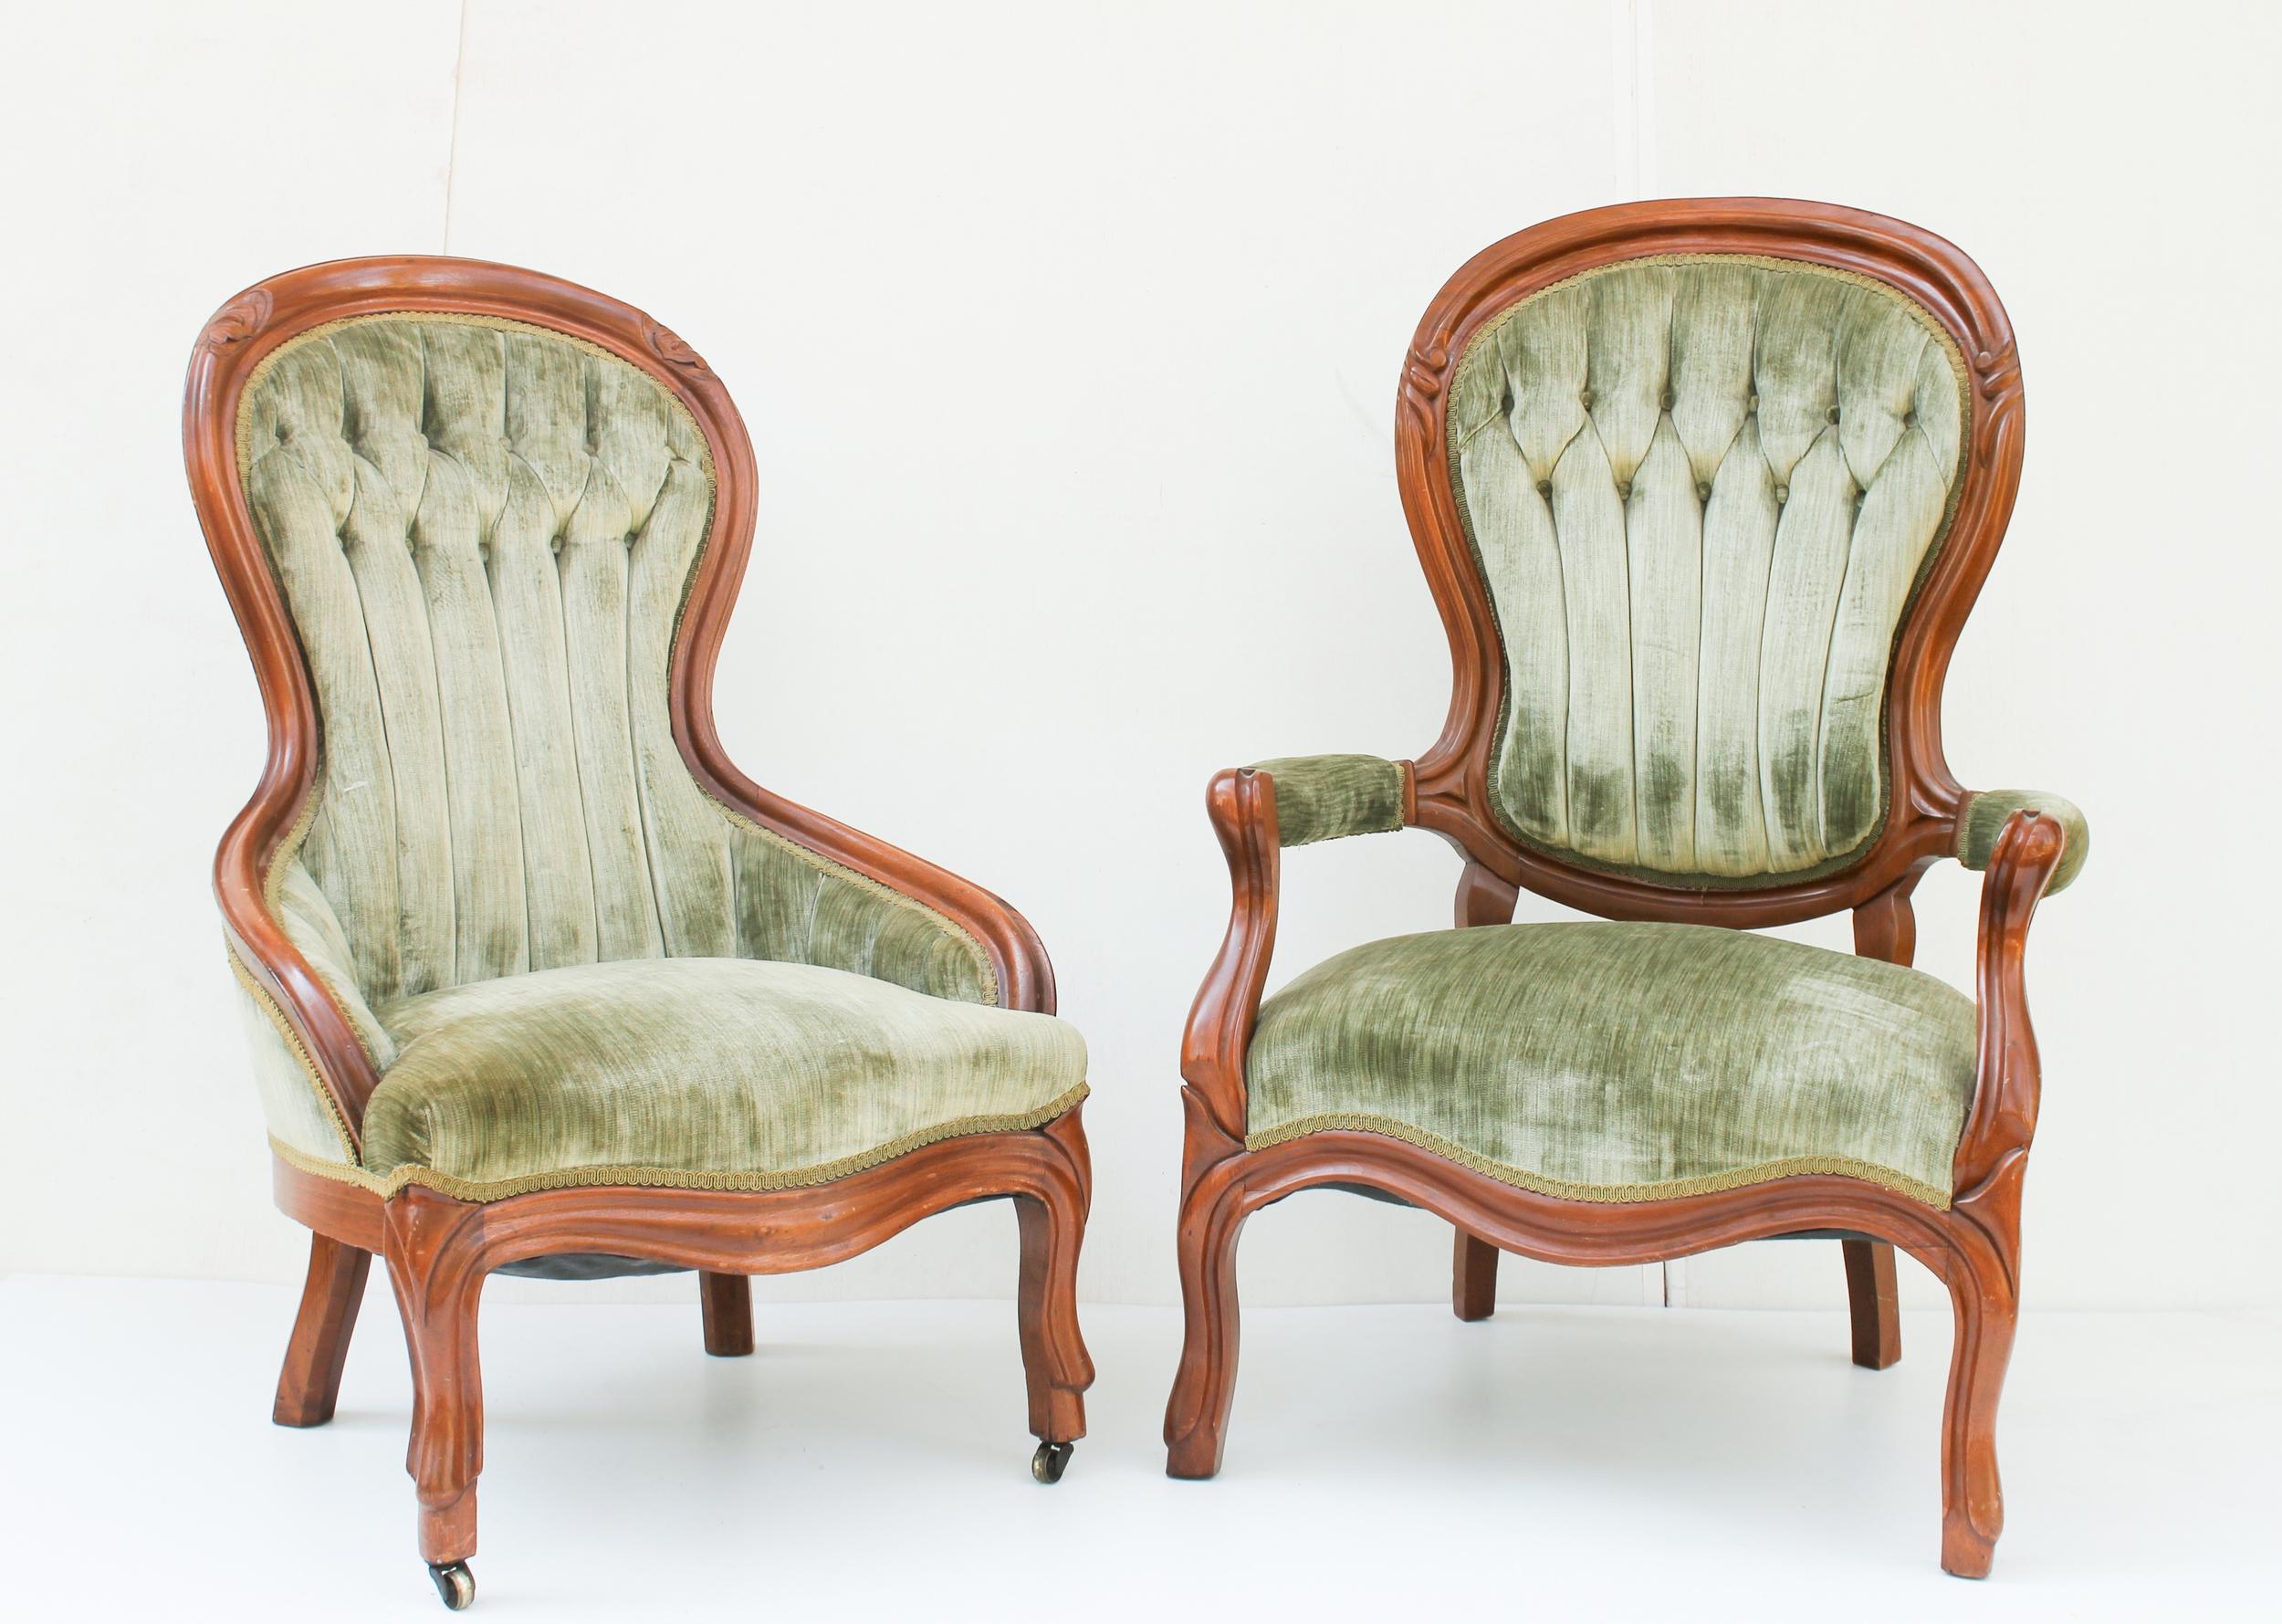 green+chairs+1-2+(1).jpg